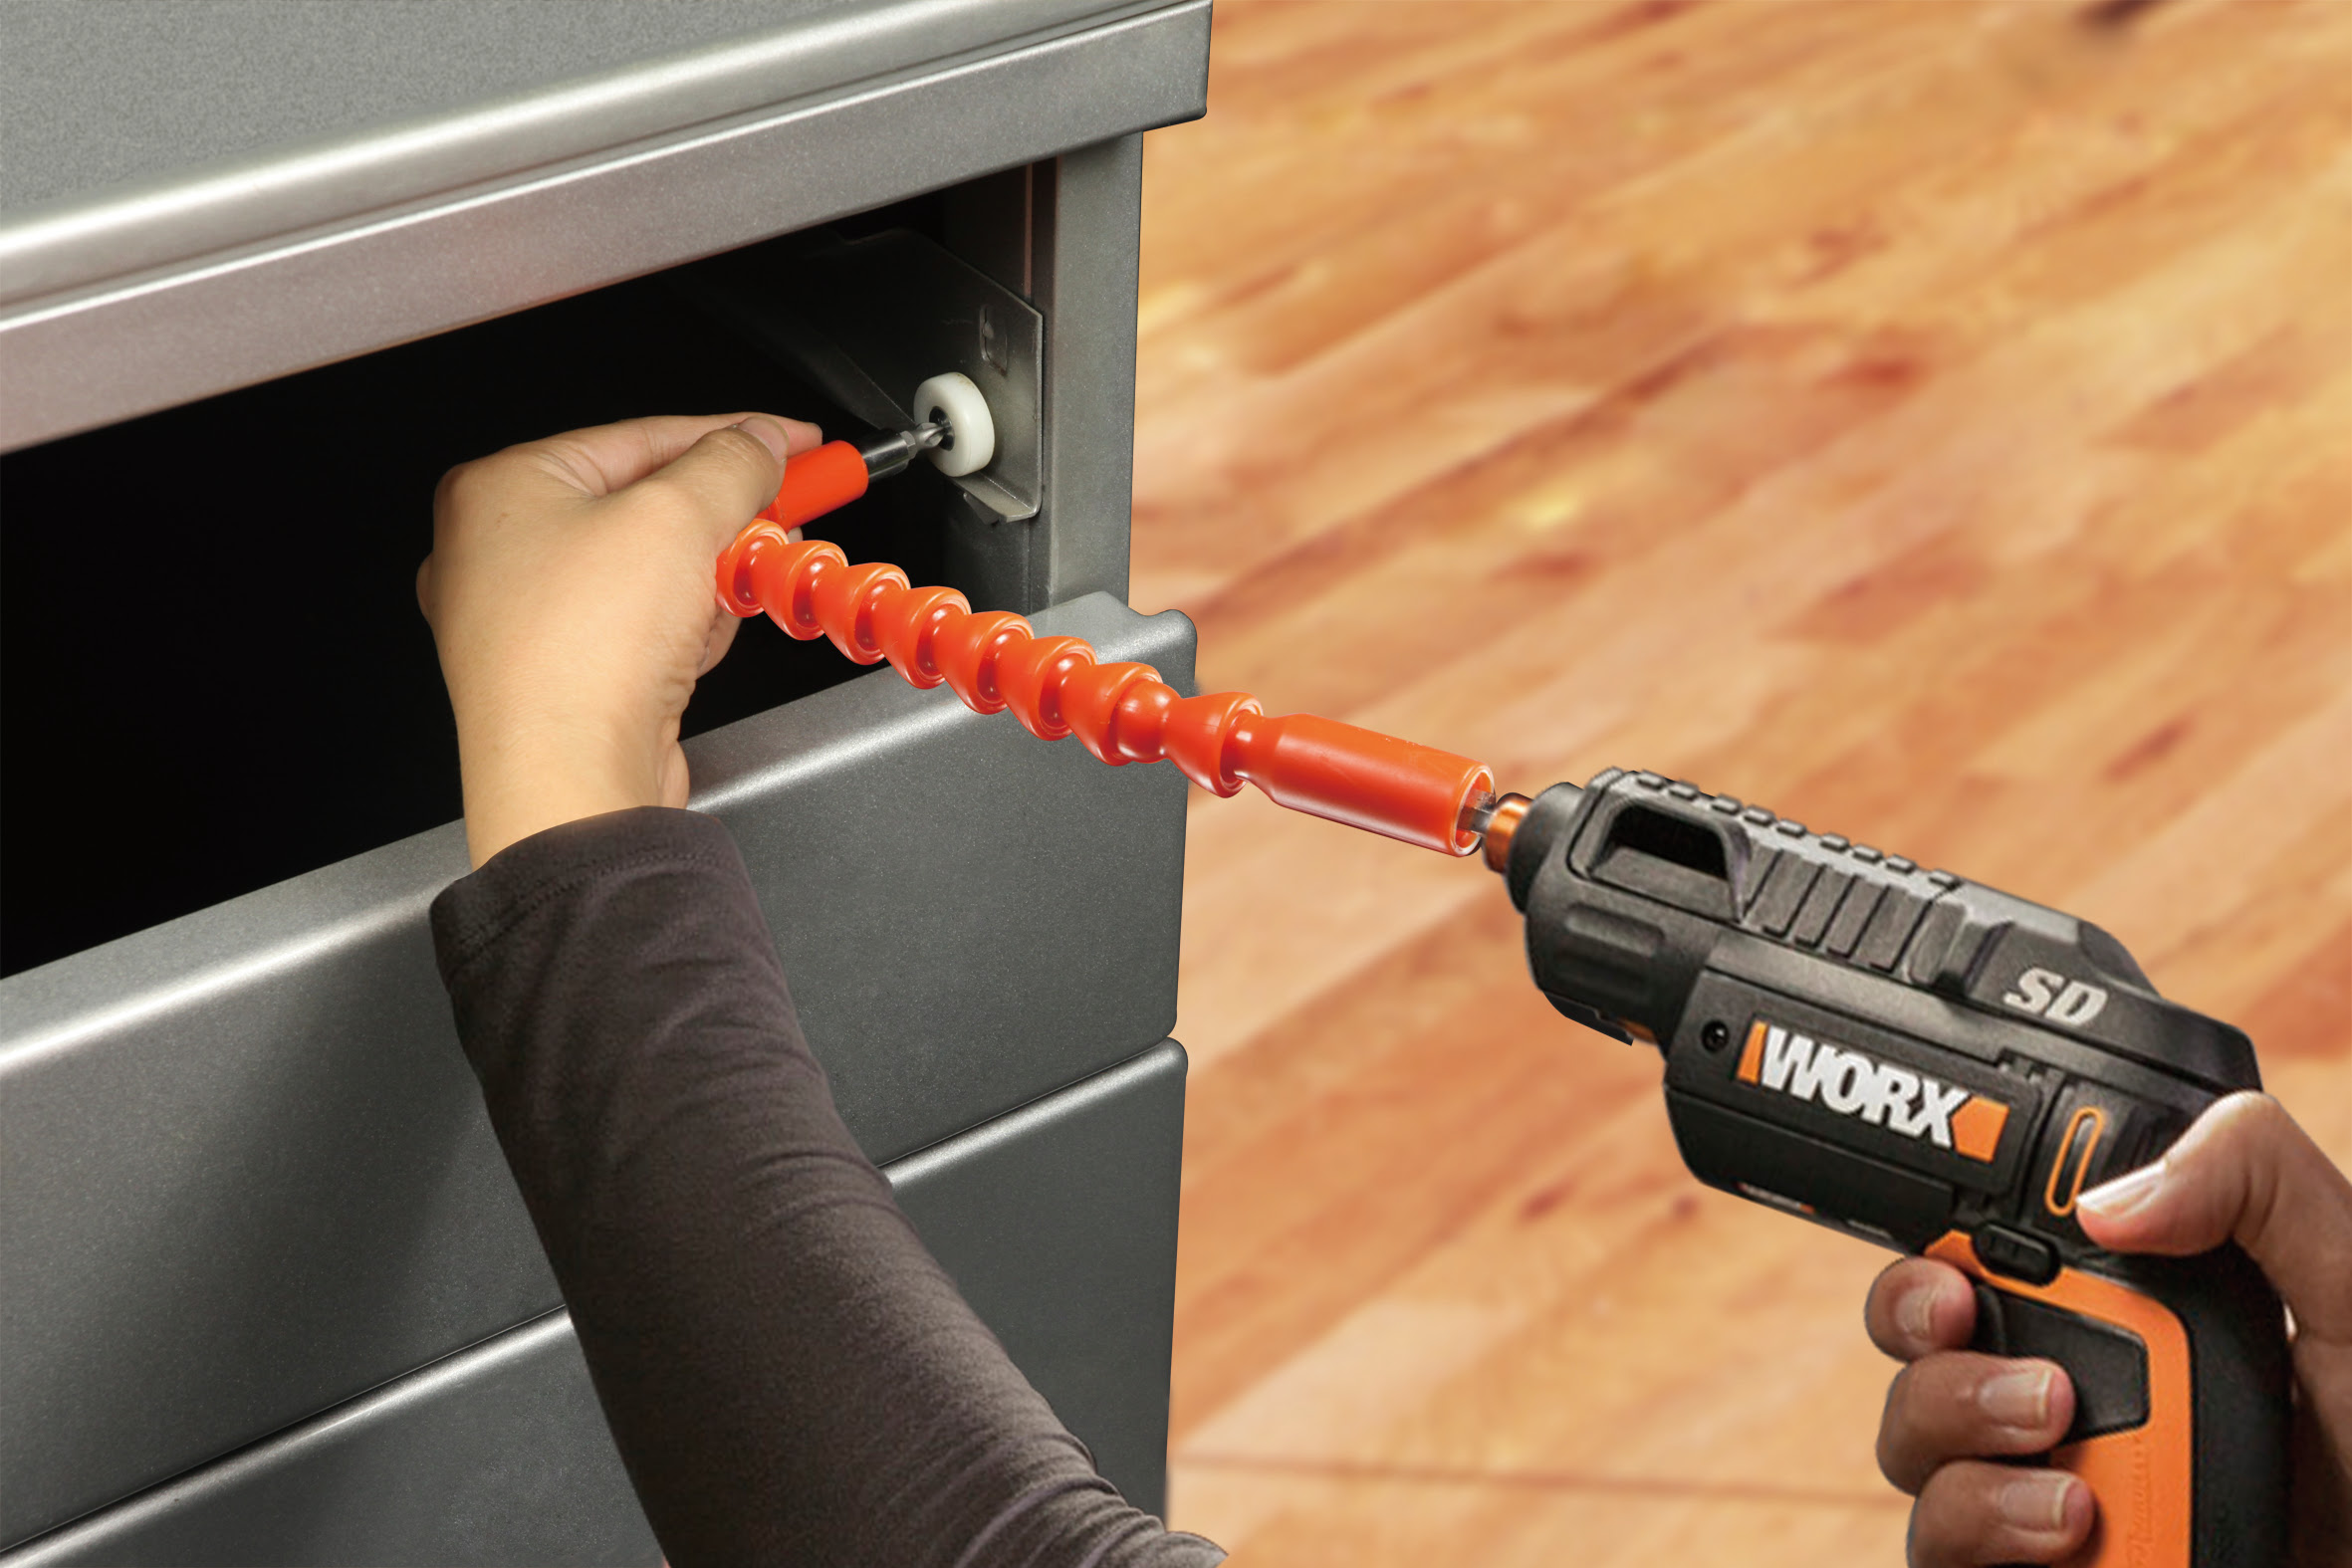 WA1061_Flexible Shaft Drilling.jpg